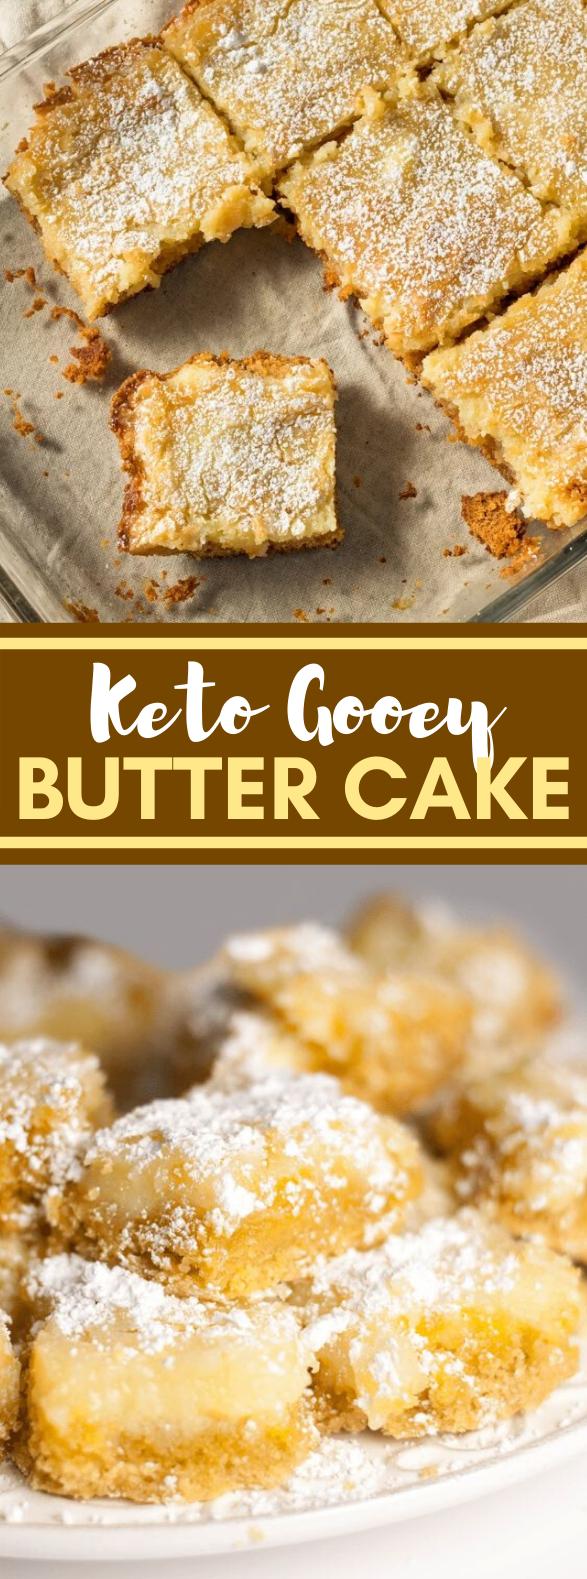 Keto Gooey Butter Cake #diet #healthydessert